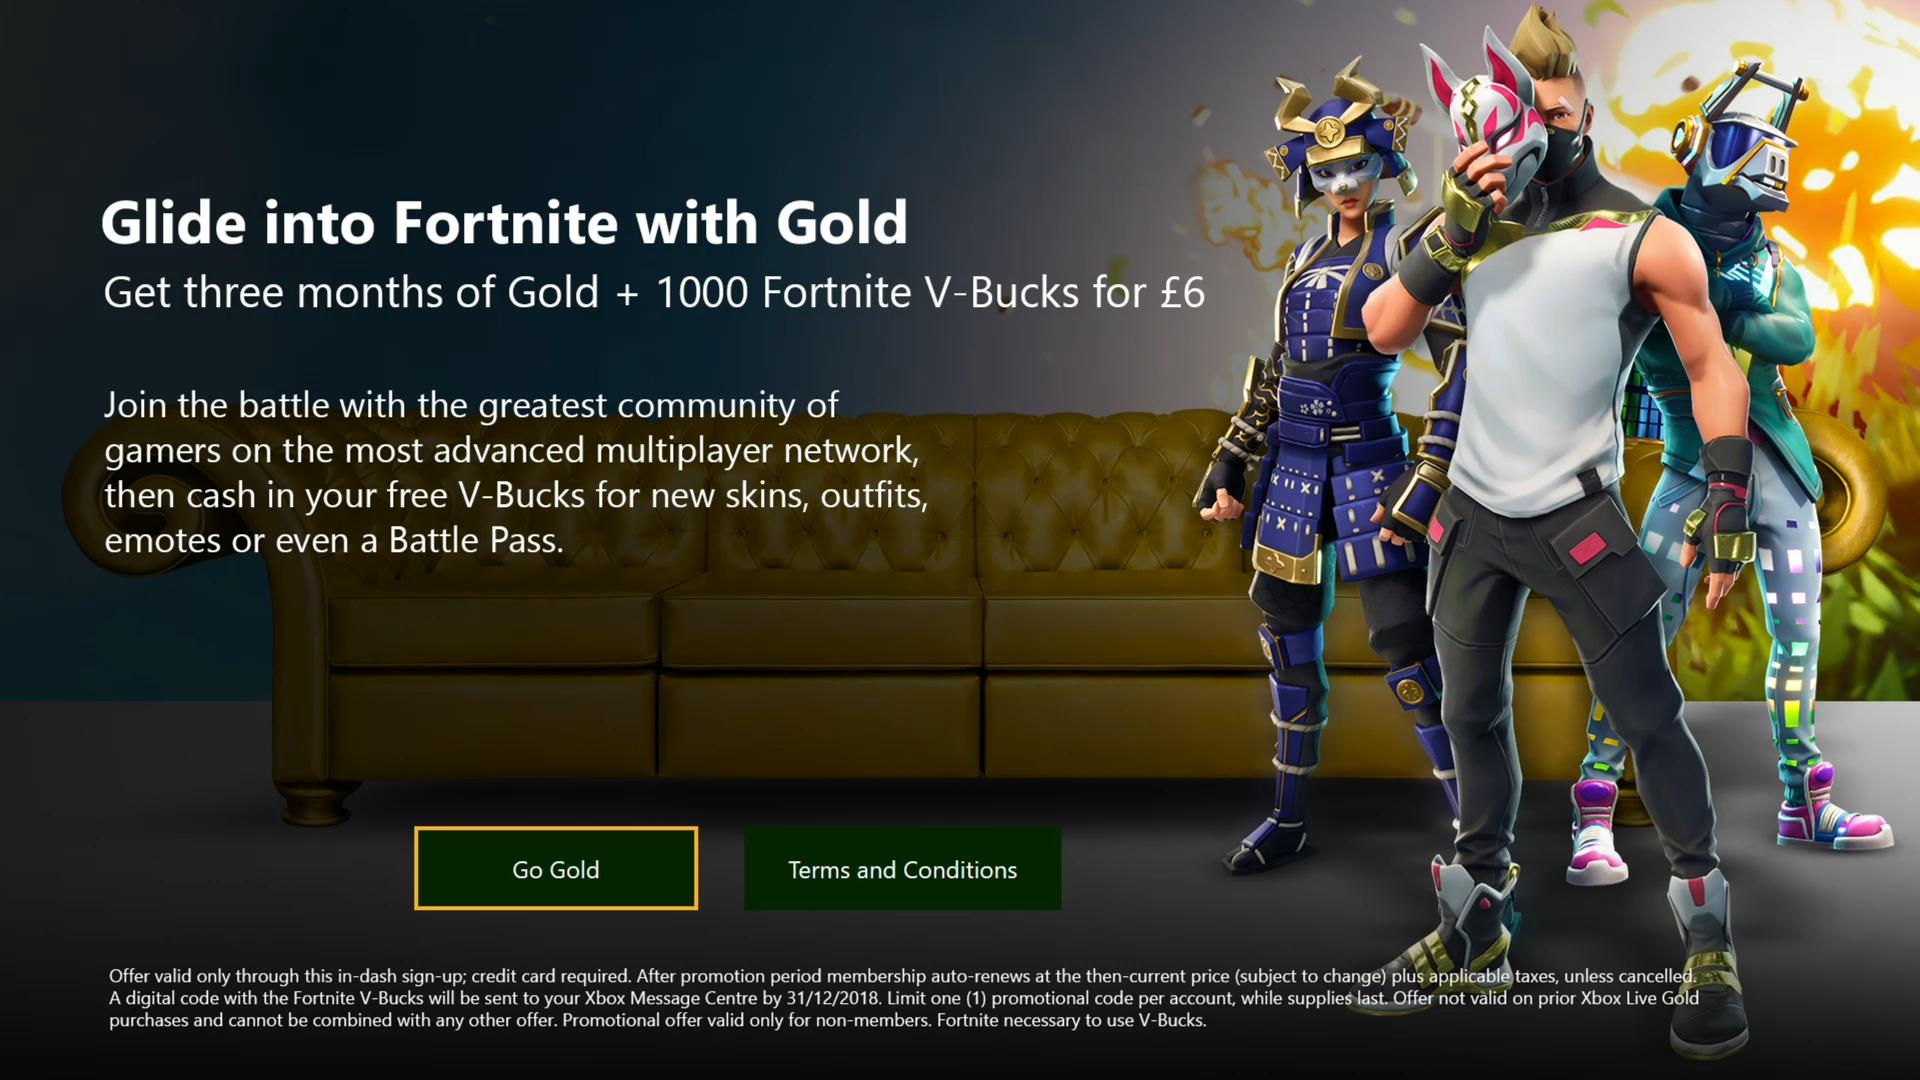 Xbox Live Gold 3 Months + 1000 Fortnite V-Bucks for £6